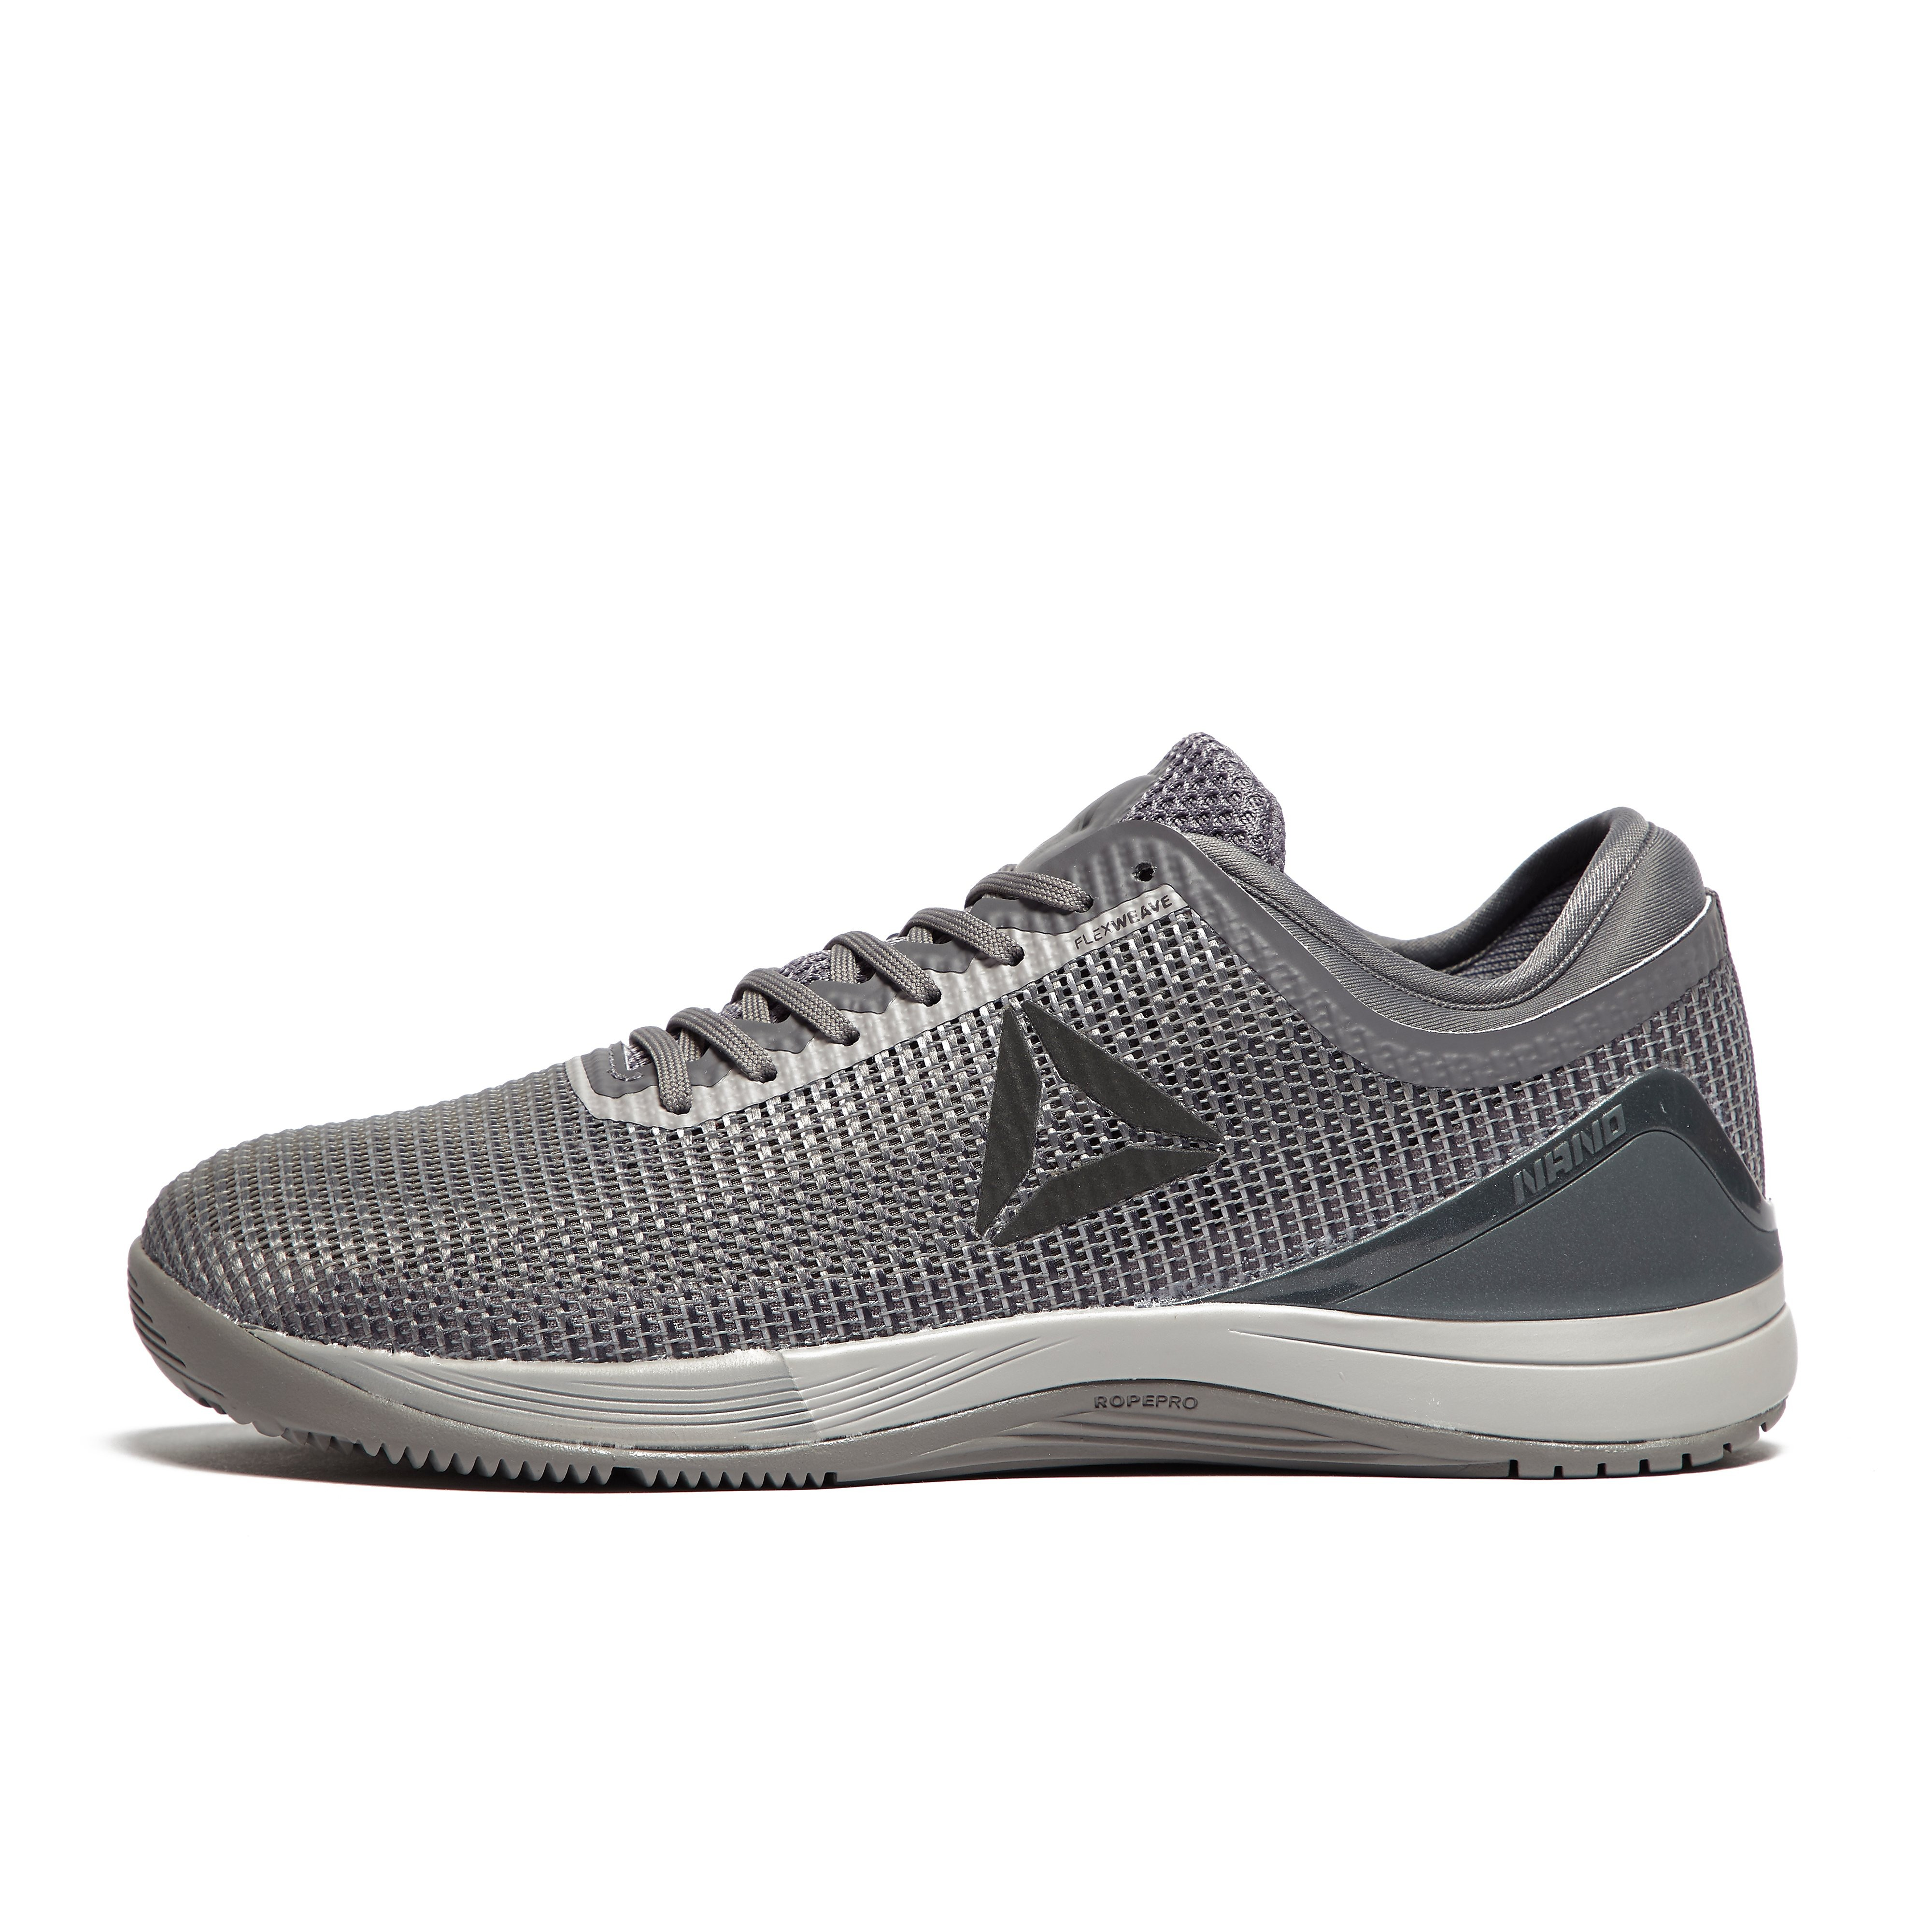 Womens Dark grey Reebok Crossfit Nano 8.0 Training Shoes